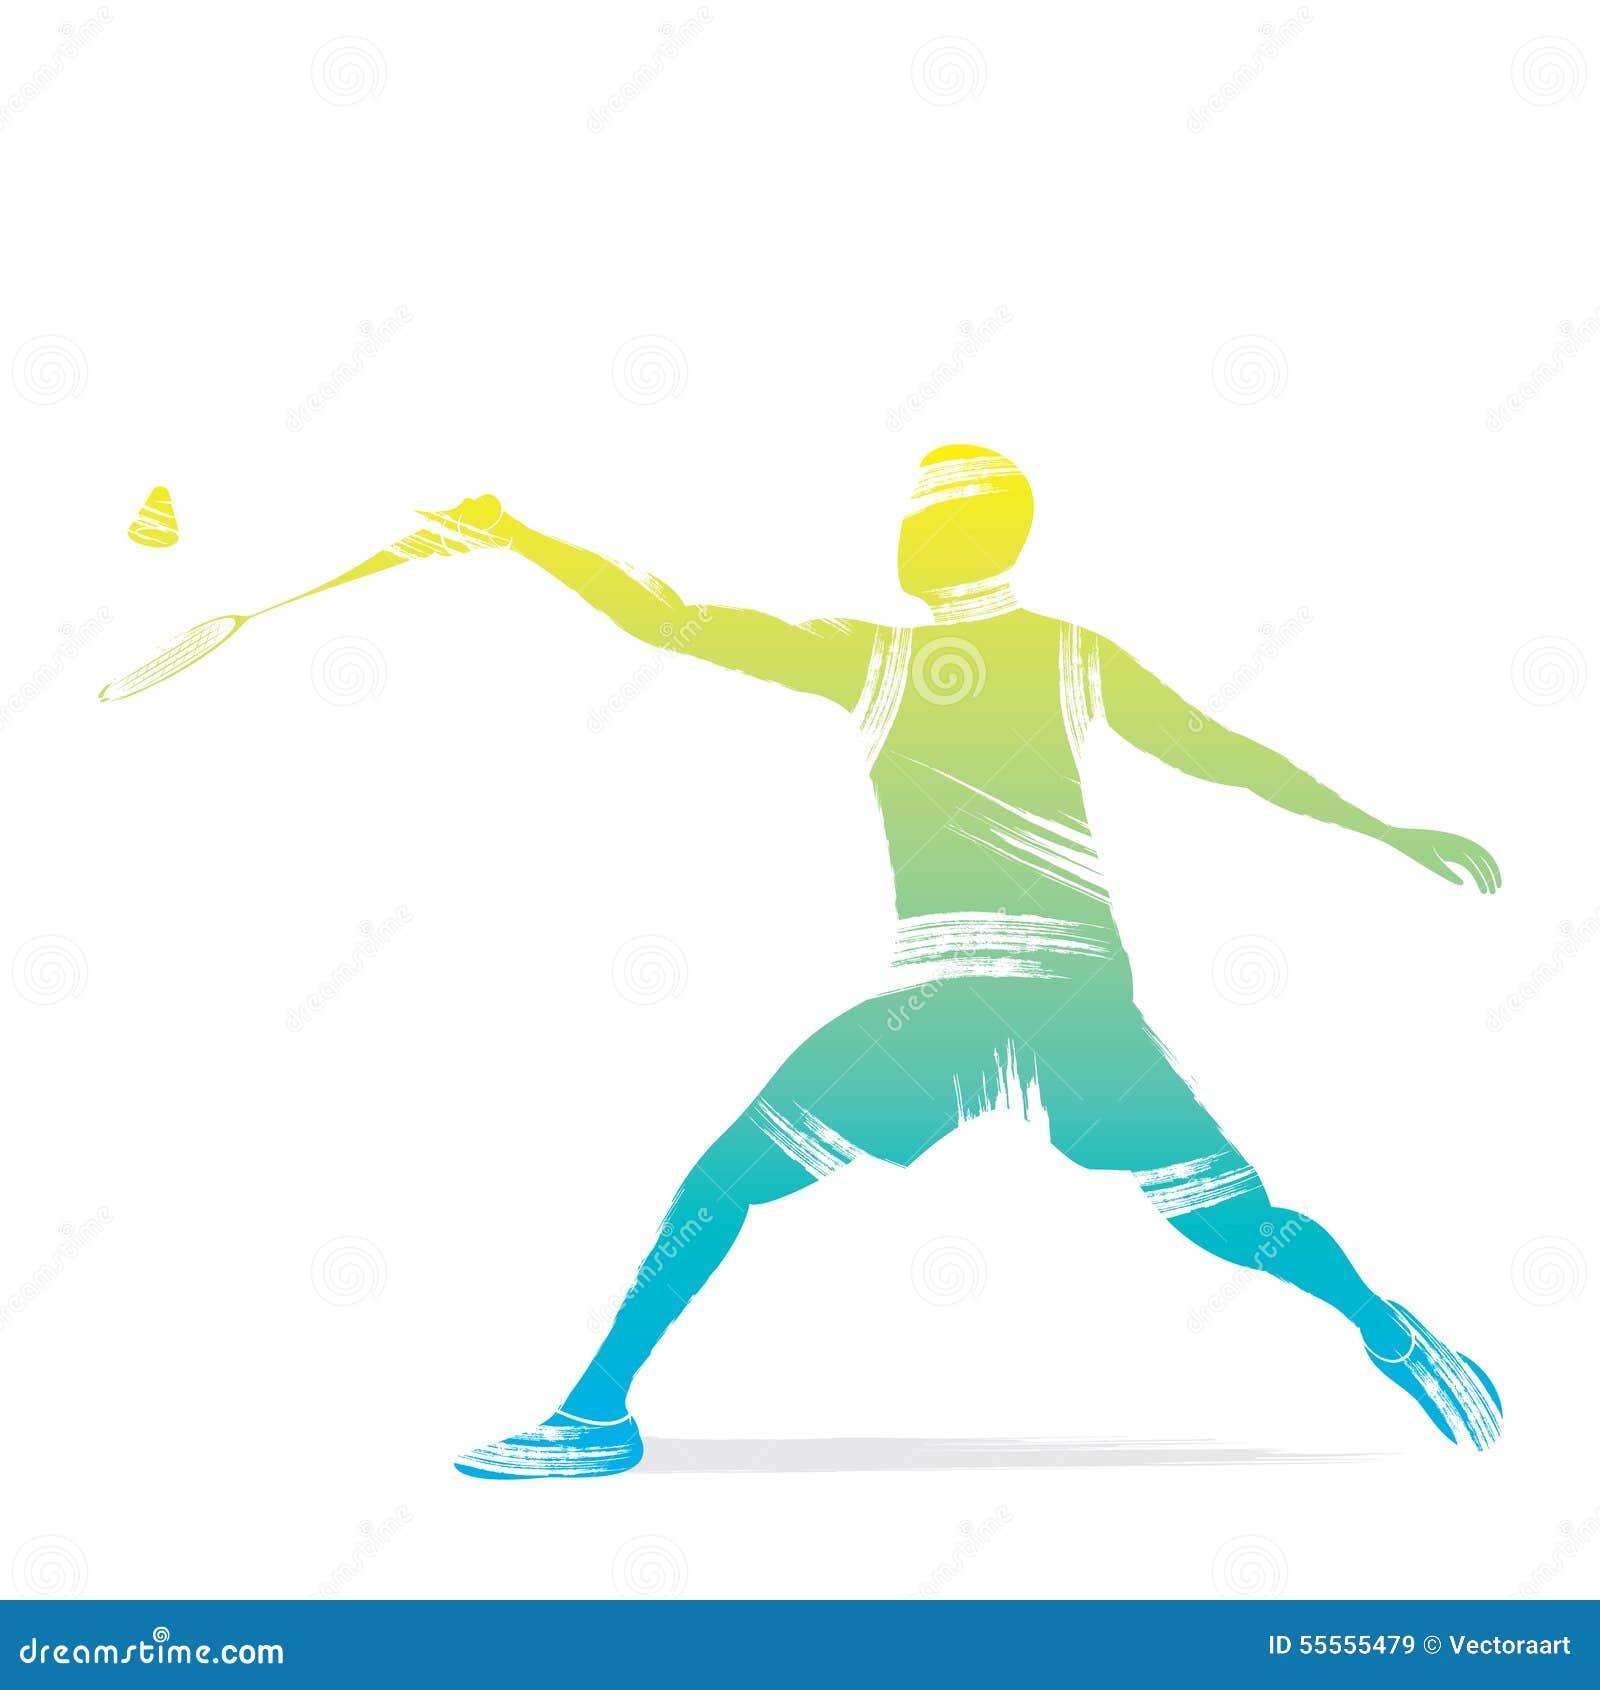 Badminton Player Design Stock Vector - Image: 55555479 Badminton Player Png